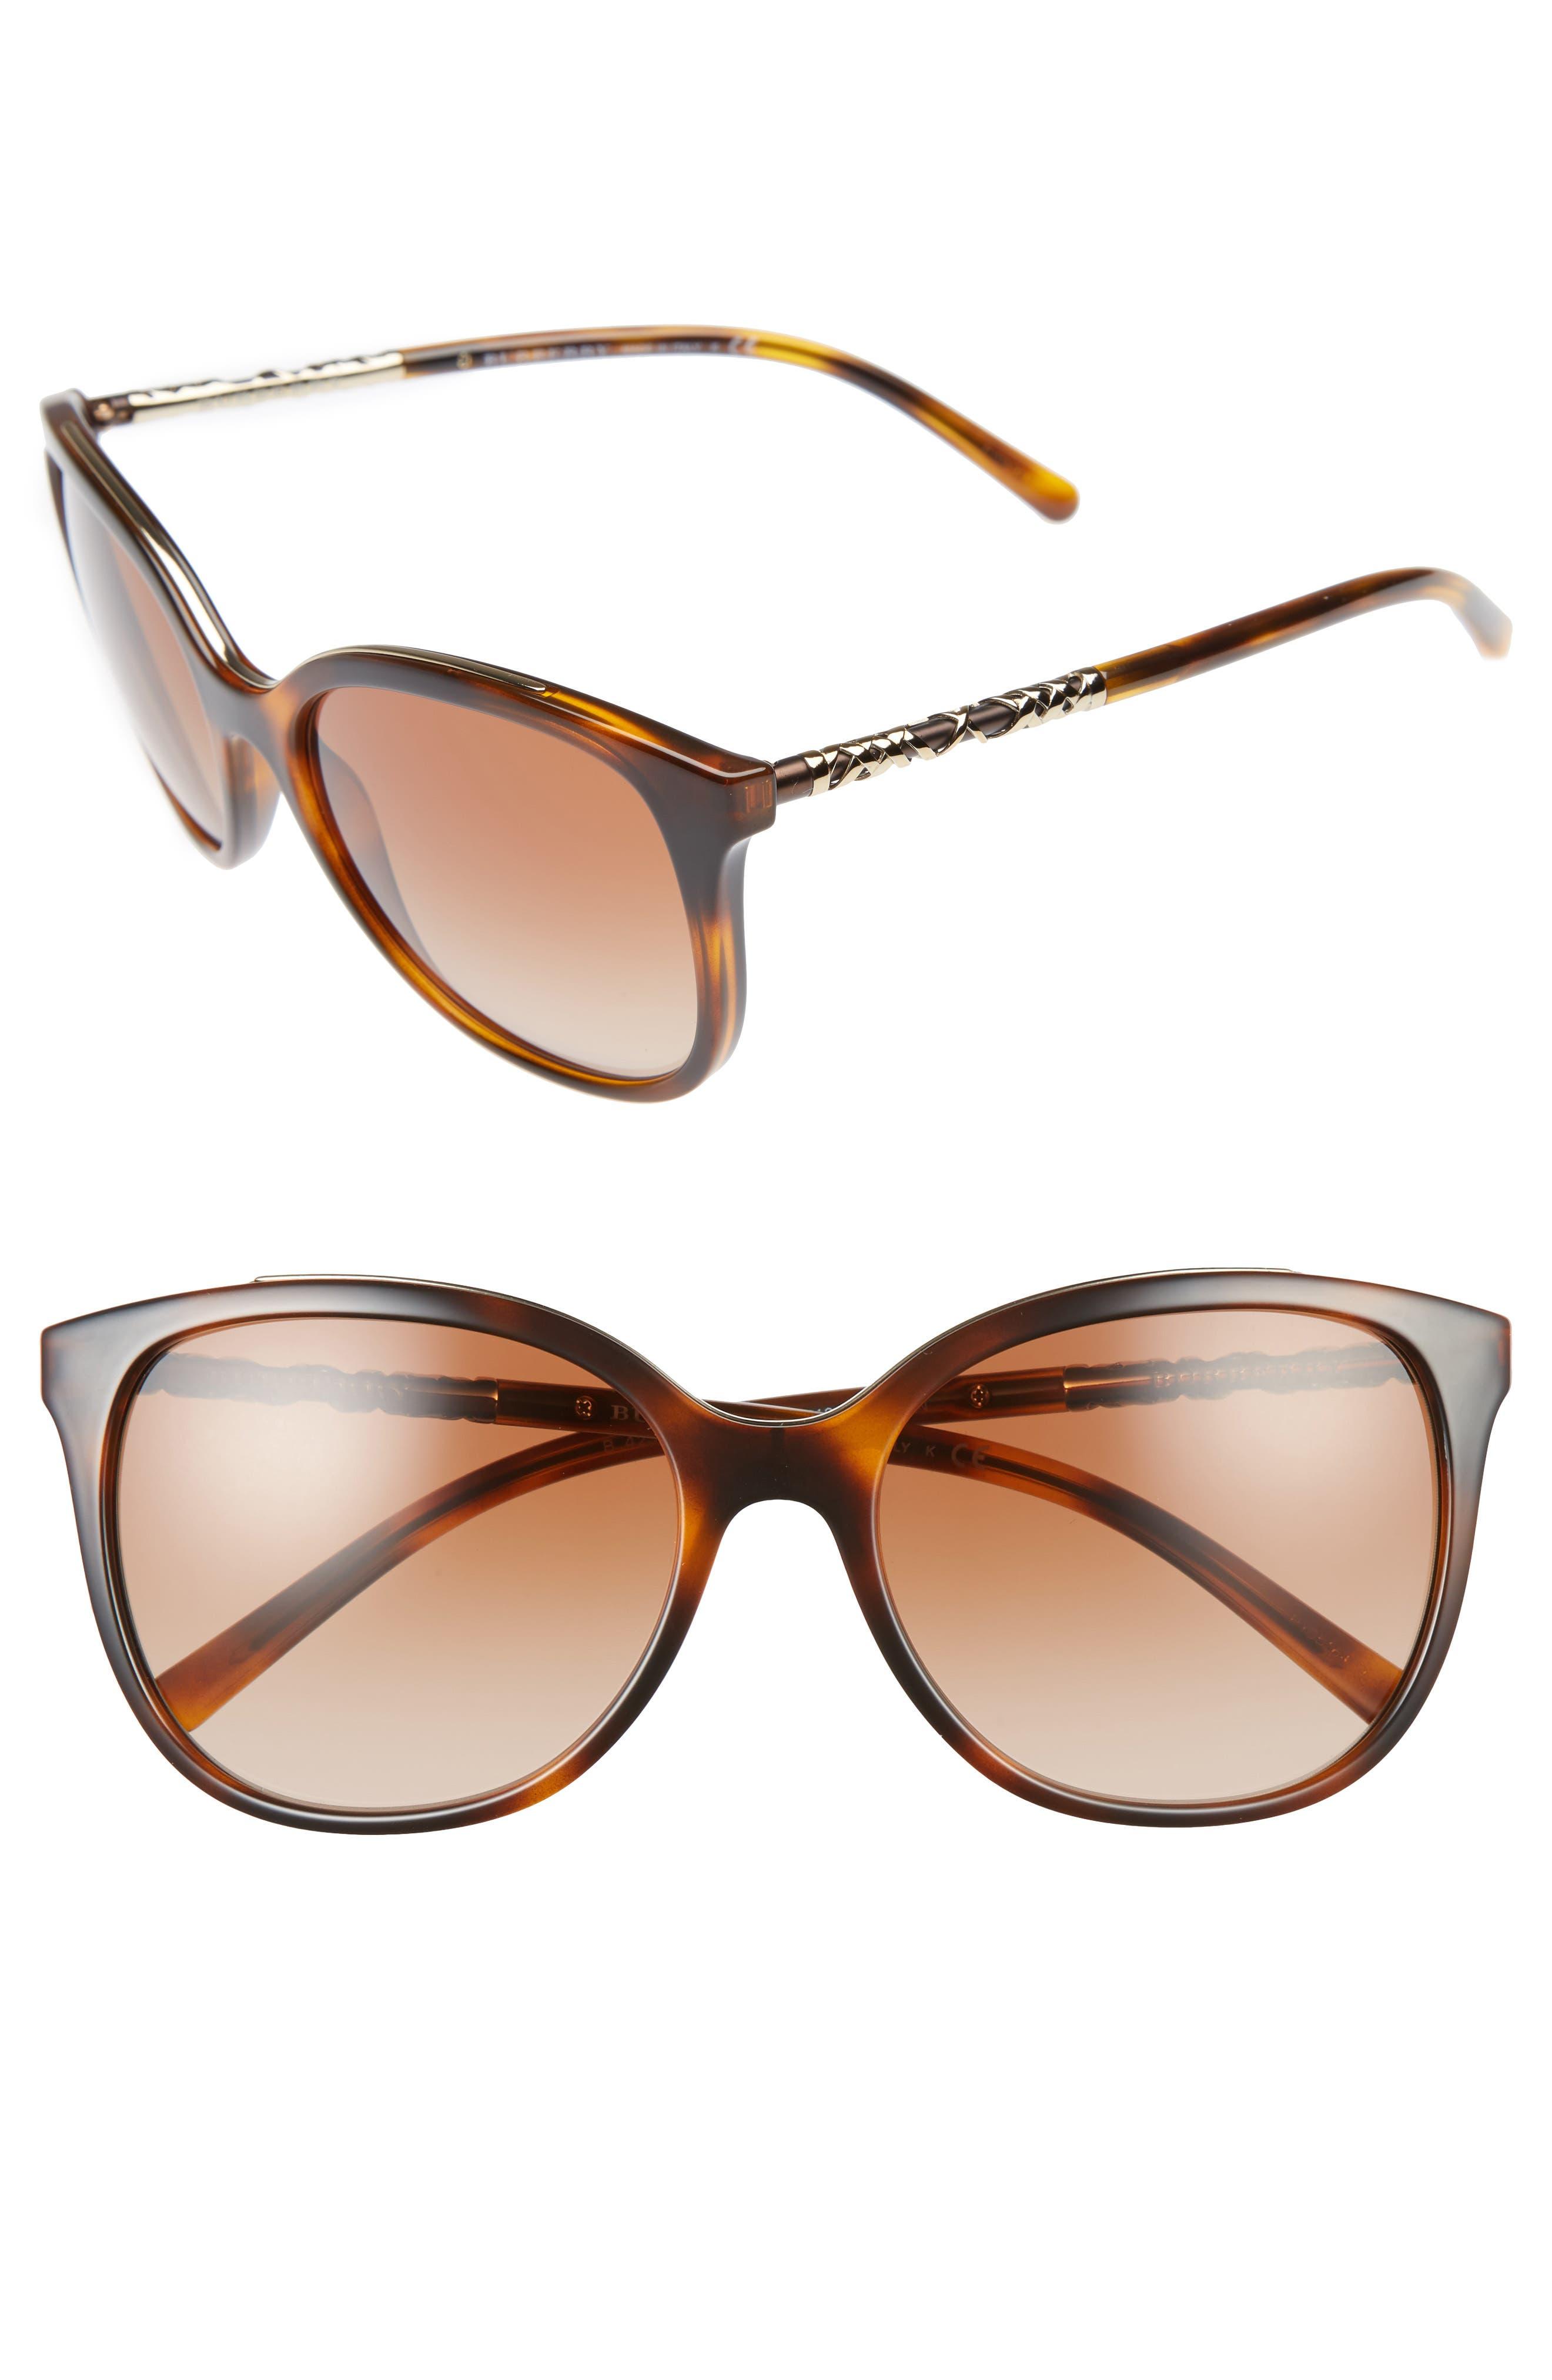 57mm Sunglasses,                         Main,                         color, Light Havana